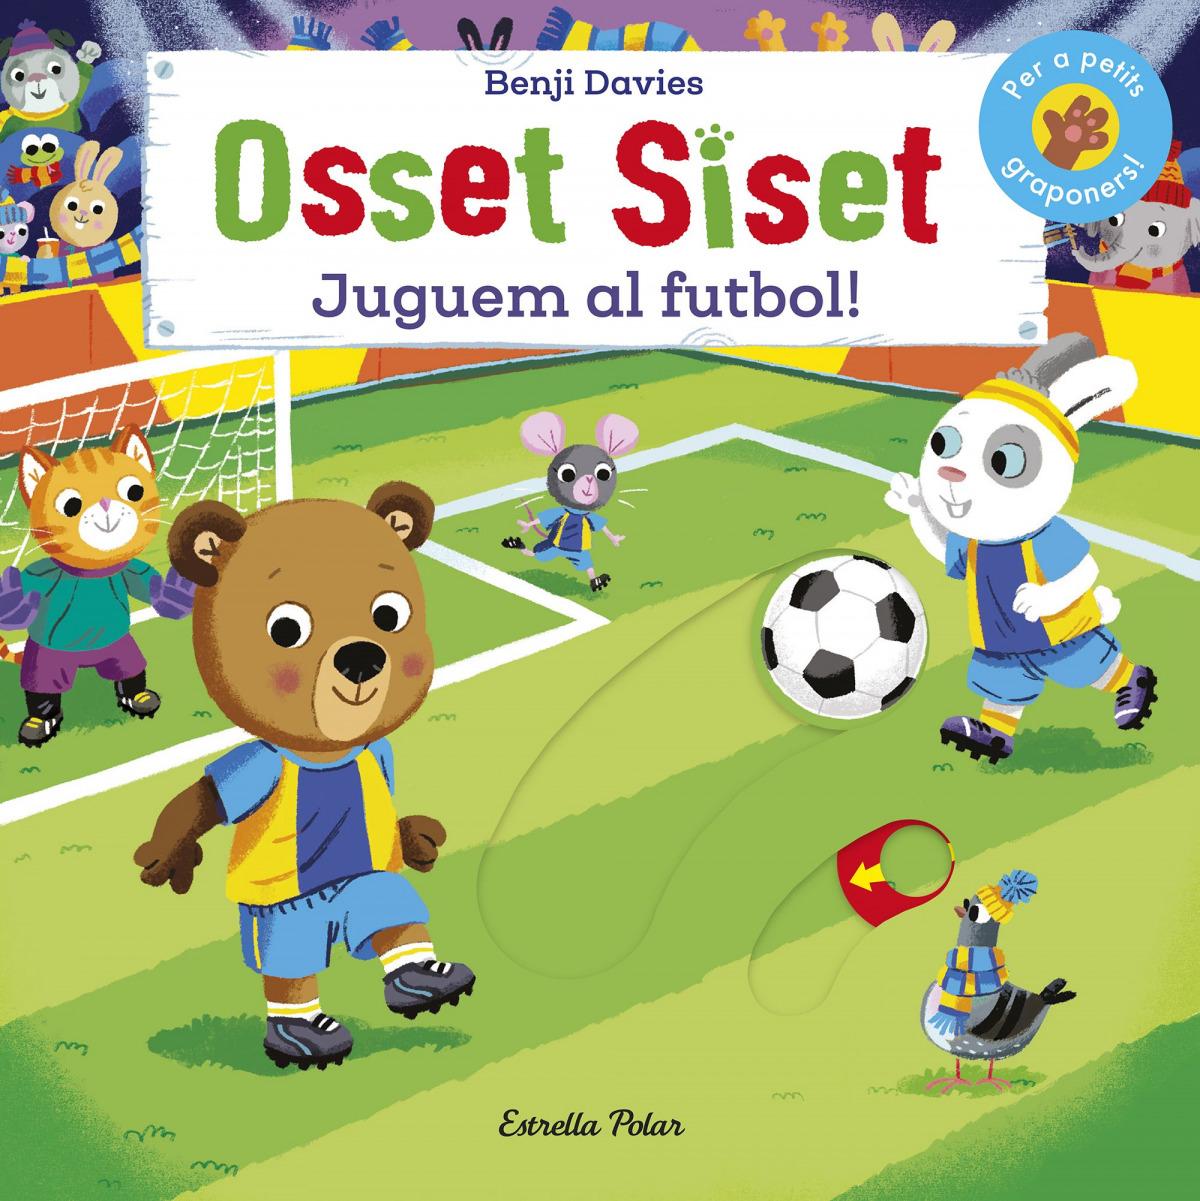 Osset Siset. Juguem al futbol